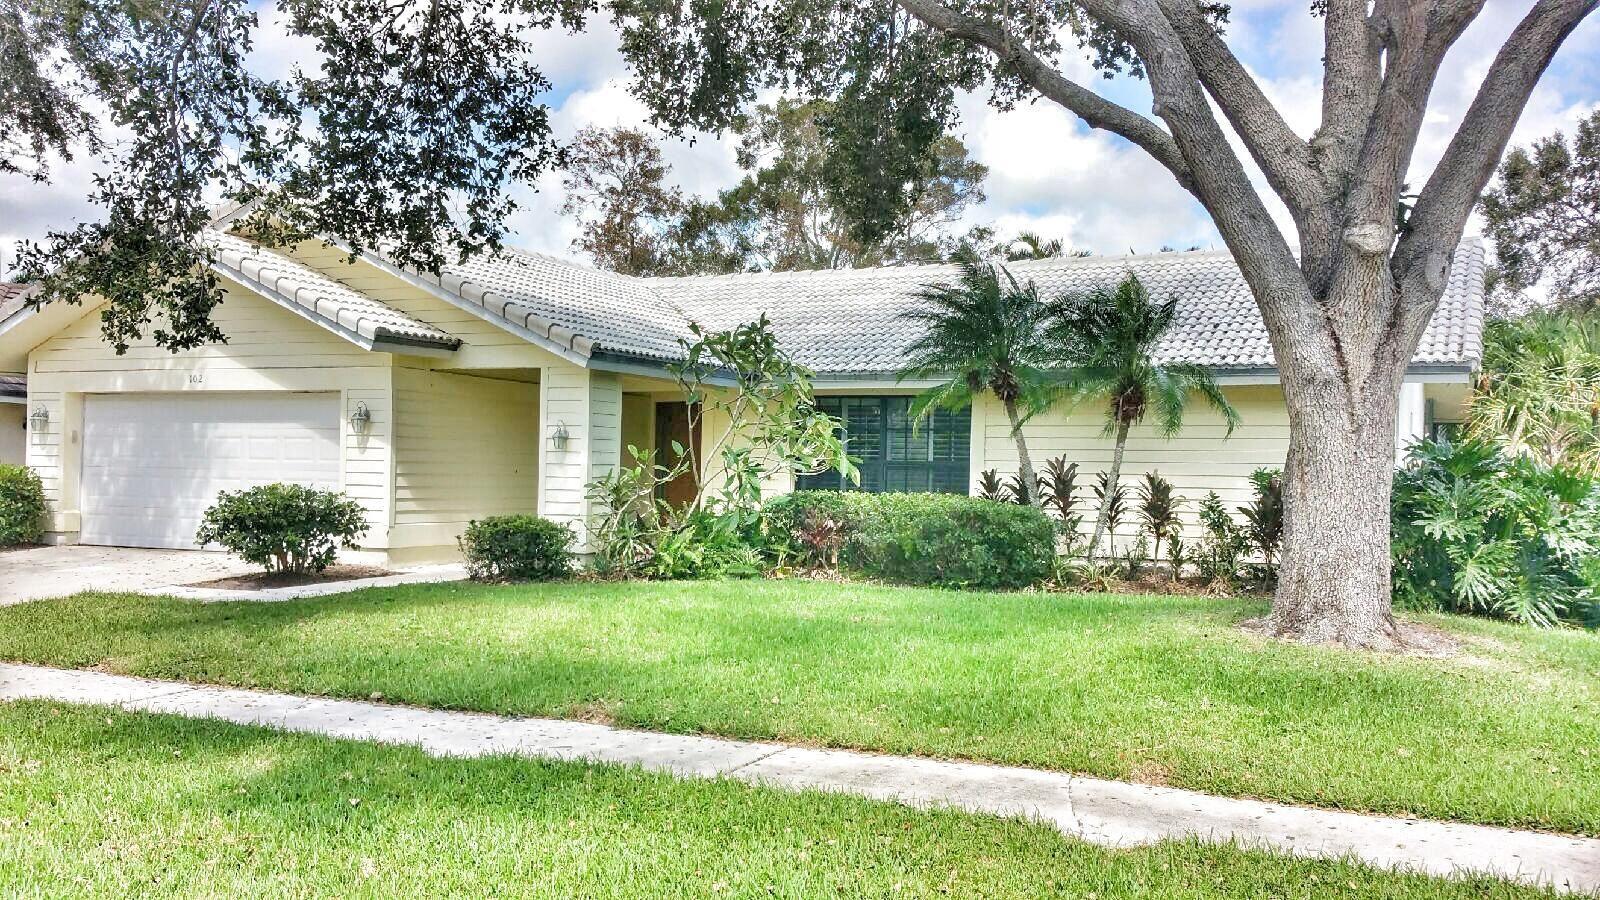 f7a118d909dd4b5145a1f916ec26beeb - Homes For Rent Evergrene Palm Beach Gardens